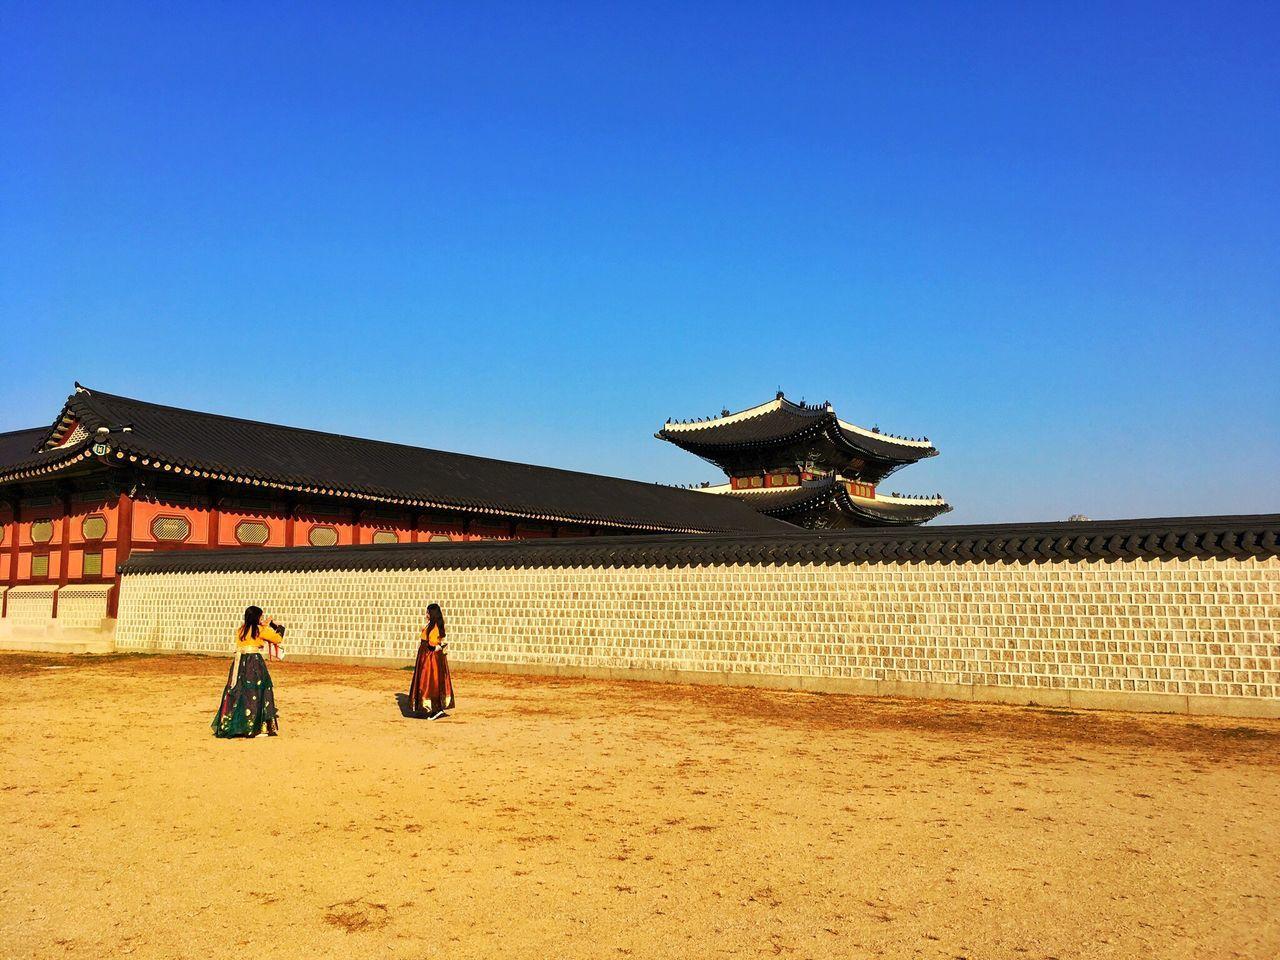 Gyungbokgung. A palace in Seoul, Korea. Architecture Blue Sky Gyungbokgung Palace Fall Autumn Korea Seoul 한국 서울 경복궁 가을 하늘 韓国 ソウル 景福宮 空